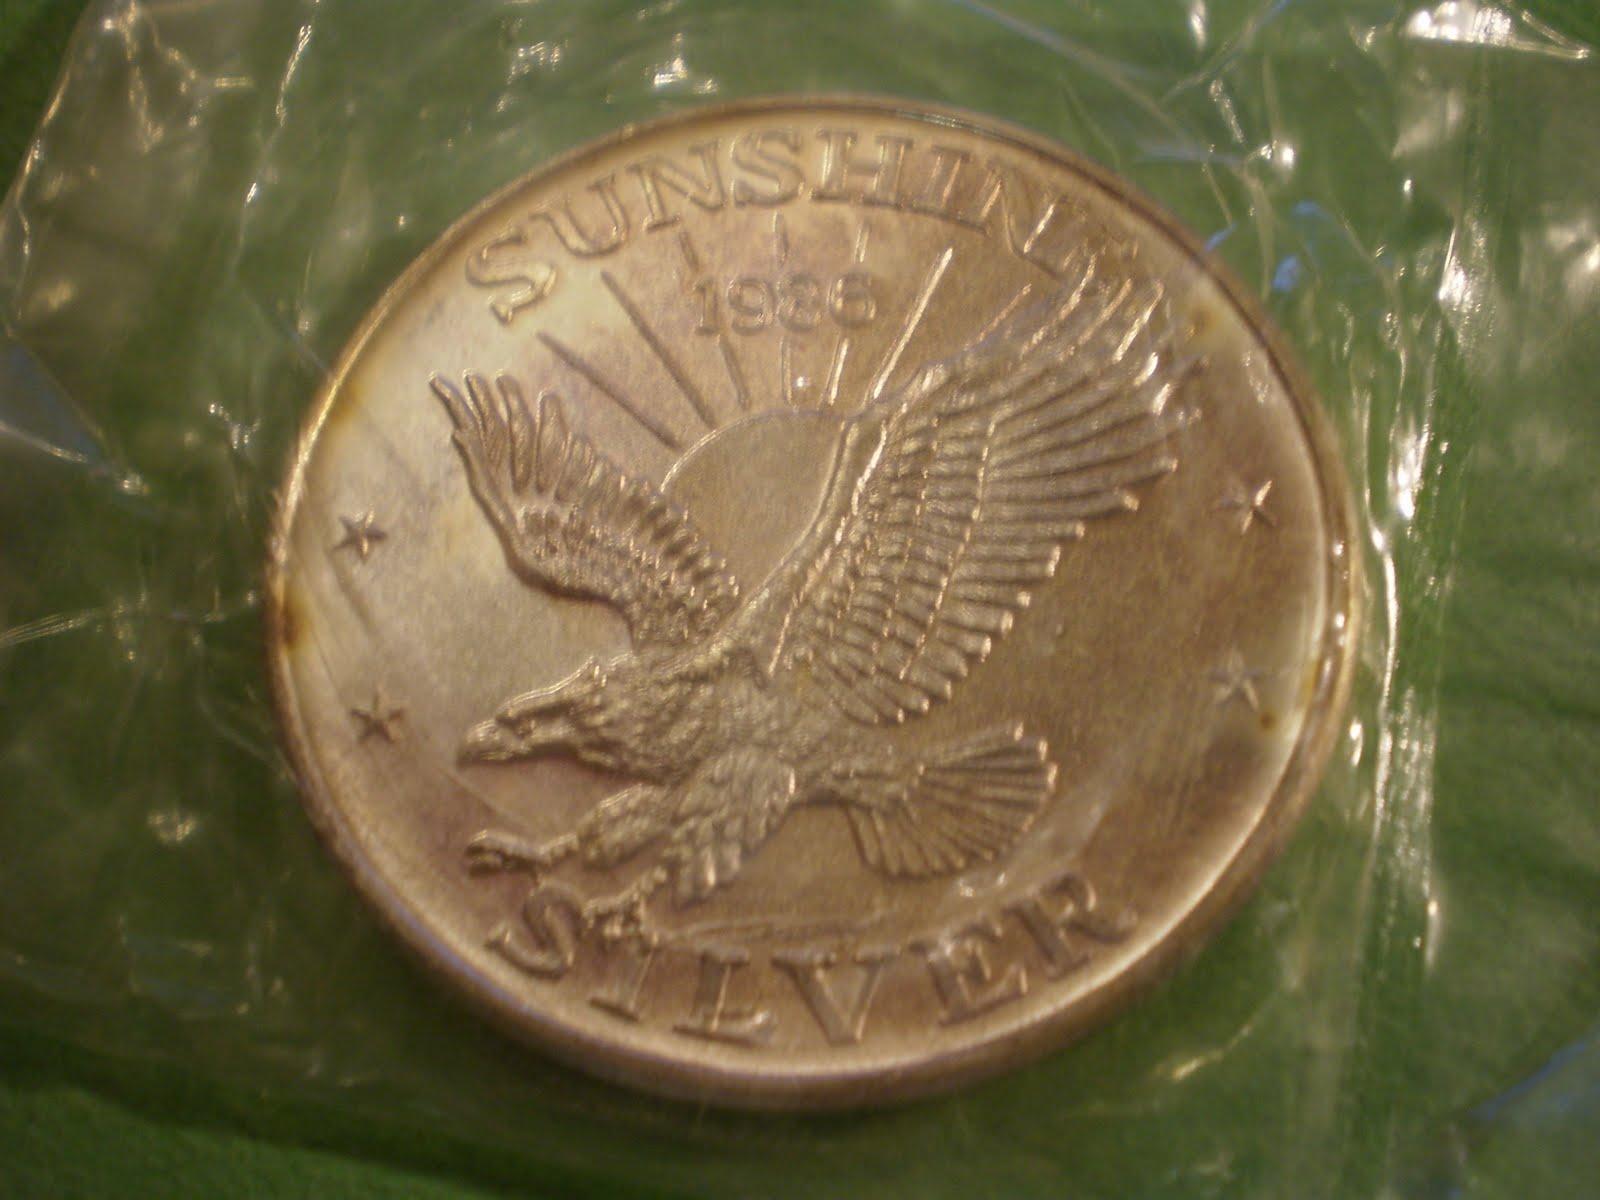 Ounces Of Silver 1986 Sunshine Mint 999 Silver One Troy Ounce Eagle Bullion Round Coin